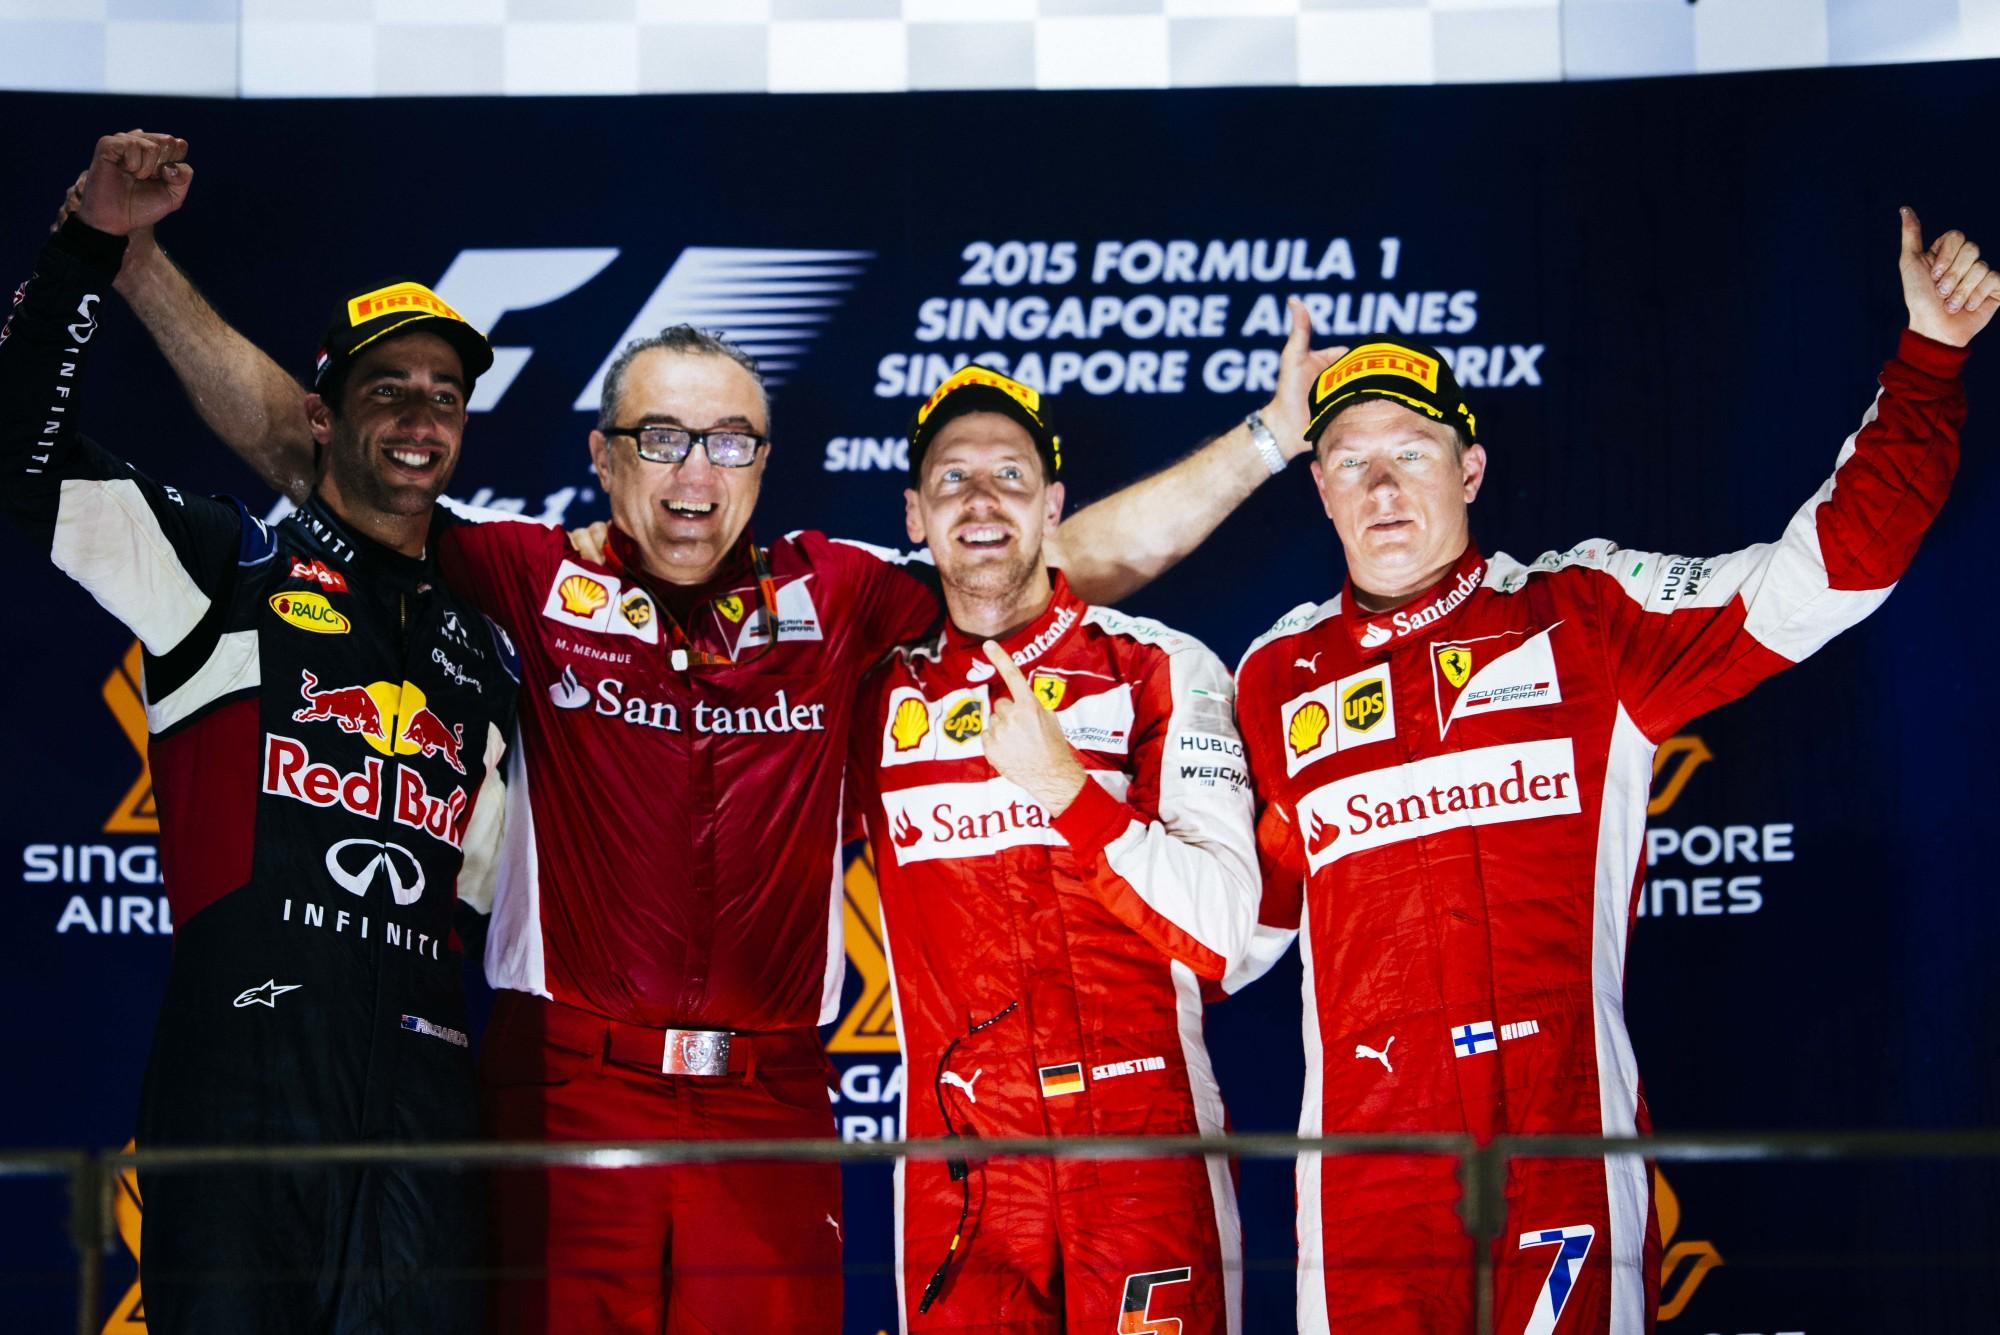 singapore gp 2015 podium f1